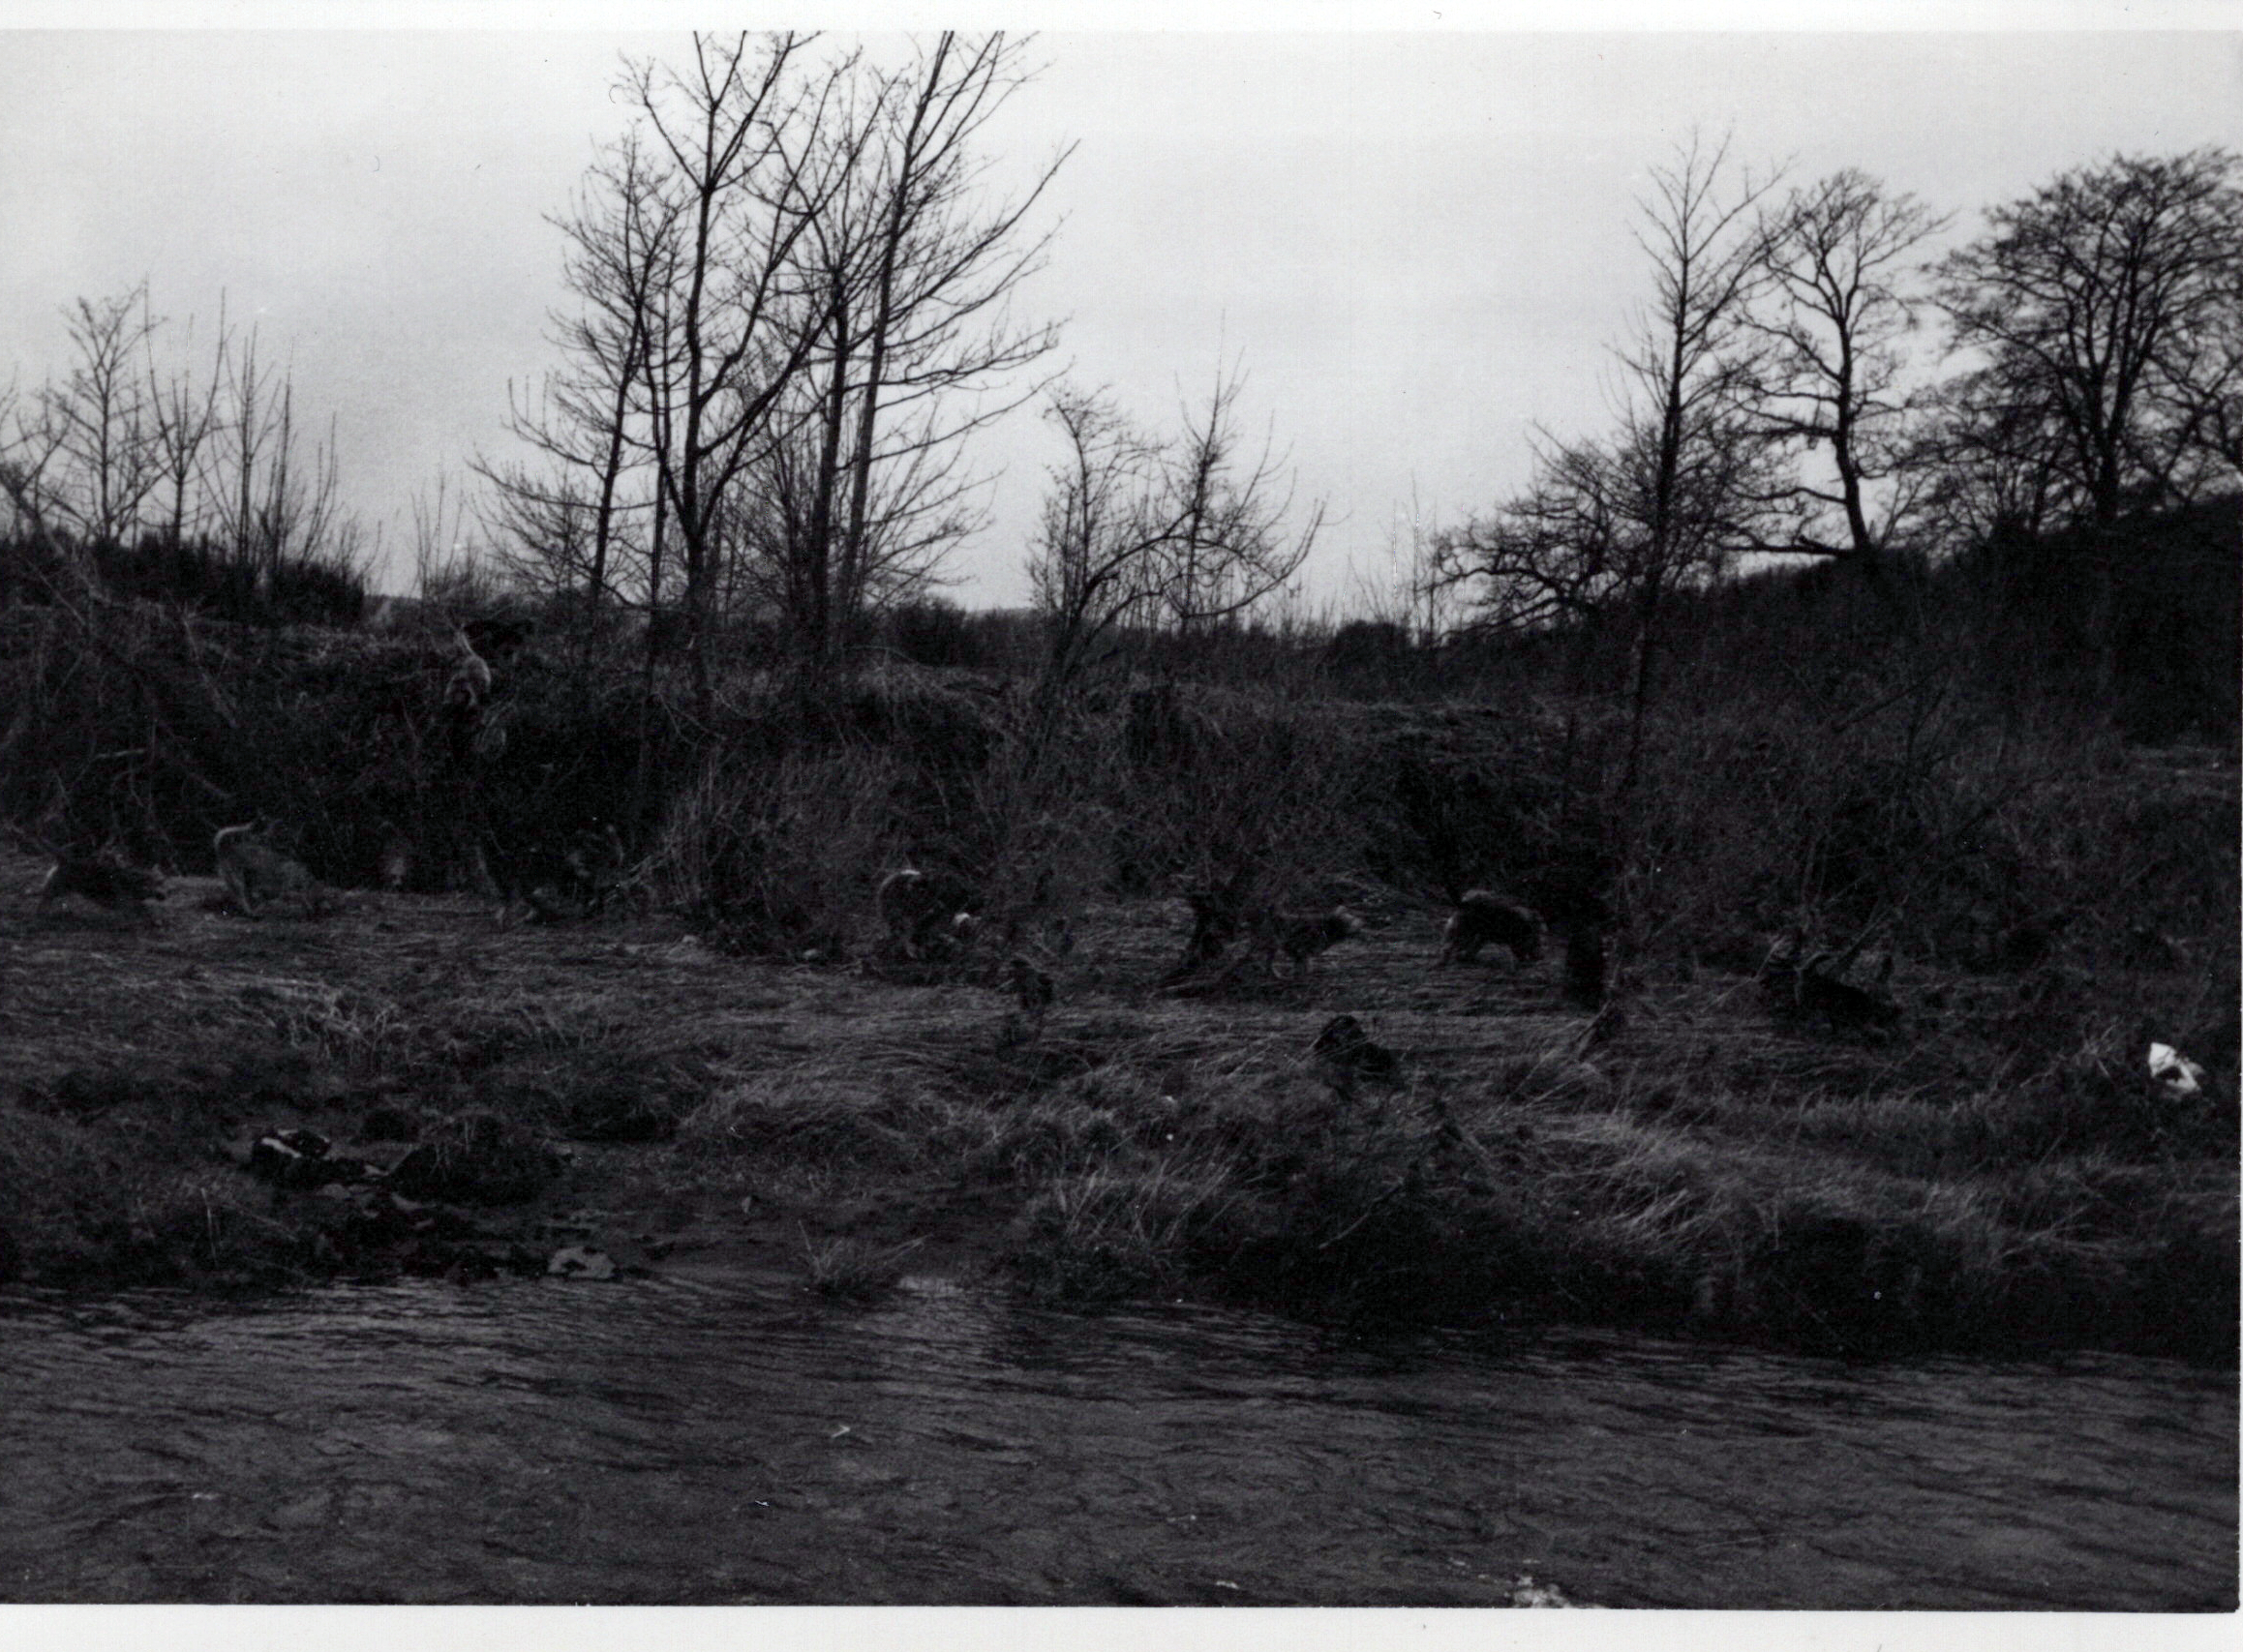 1970_Mei_Otterhound-Schotland_0002_a